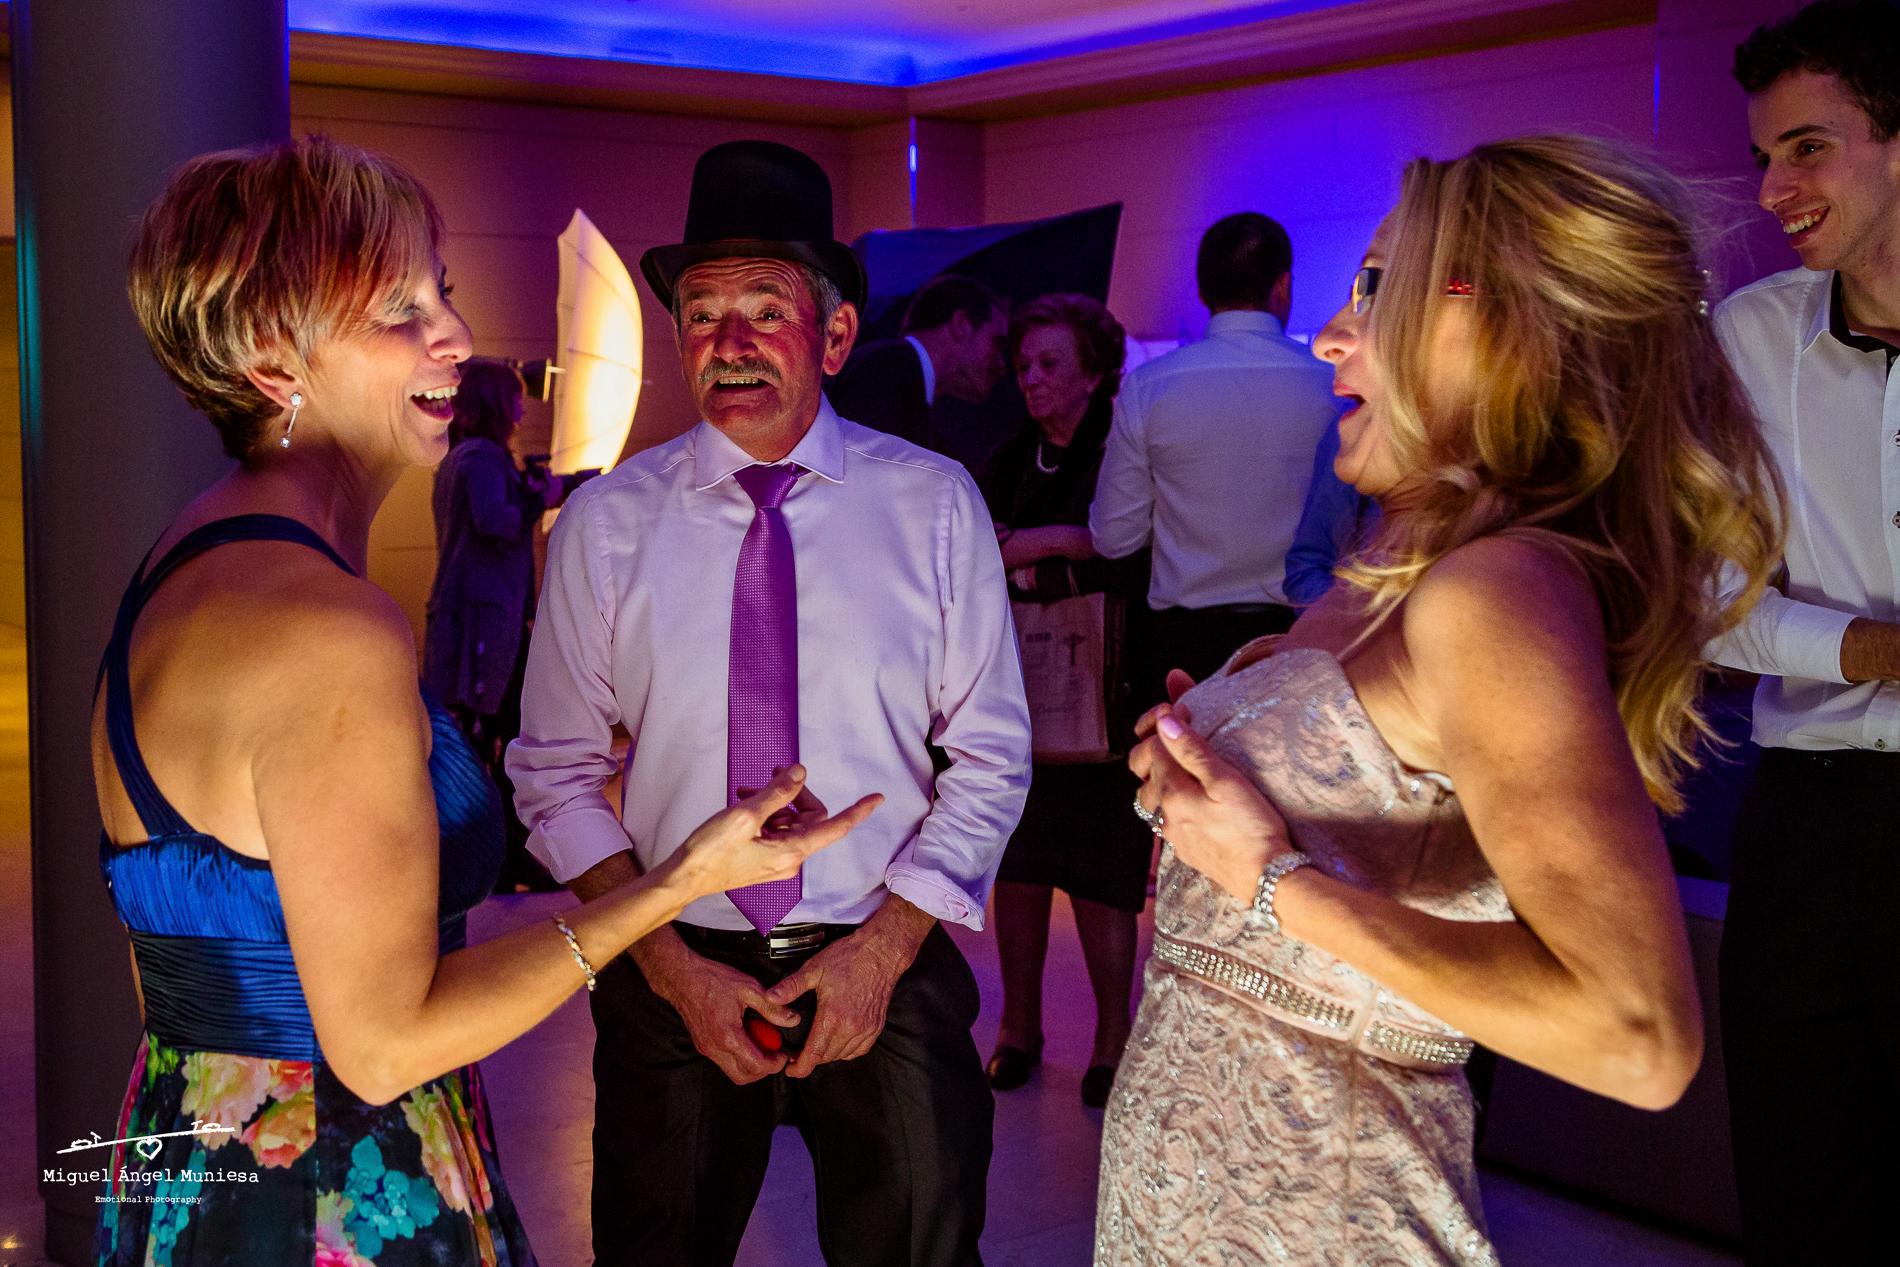 miguel angel muniesa, fotografo boda Teruel, fotografo boda navarra, fotografo boda zaragoza, fotografo boda soria, miguel angel muniesa emotional photography_26